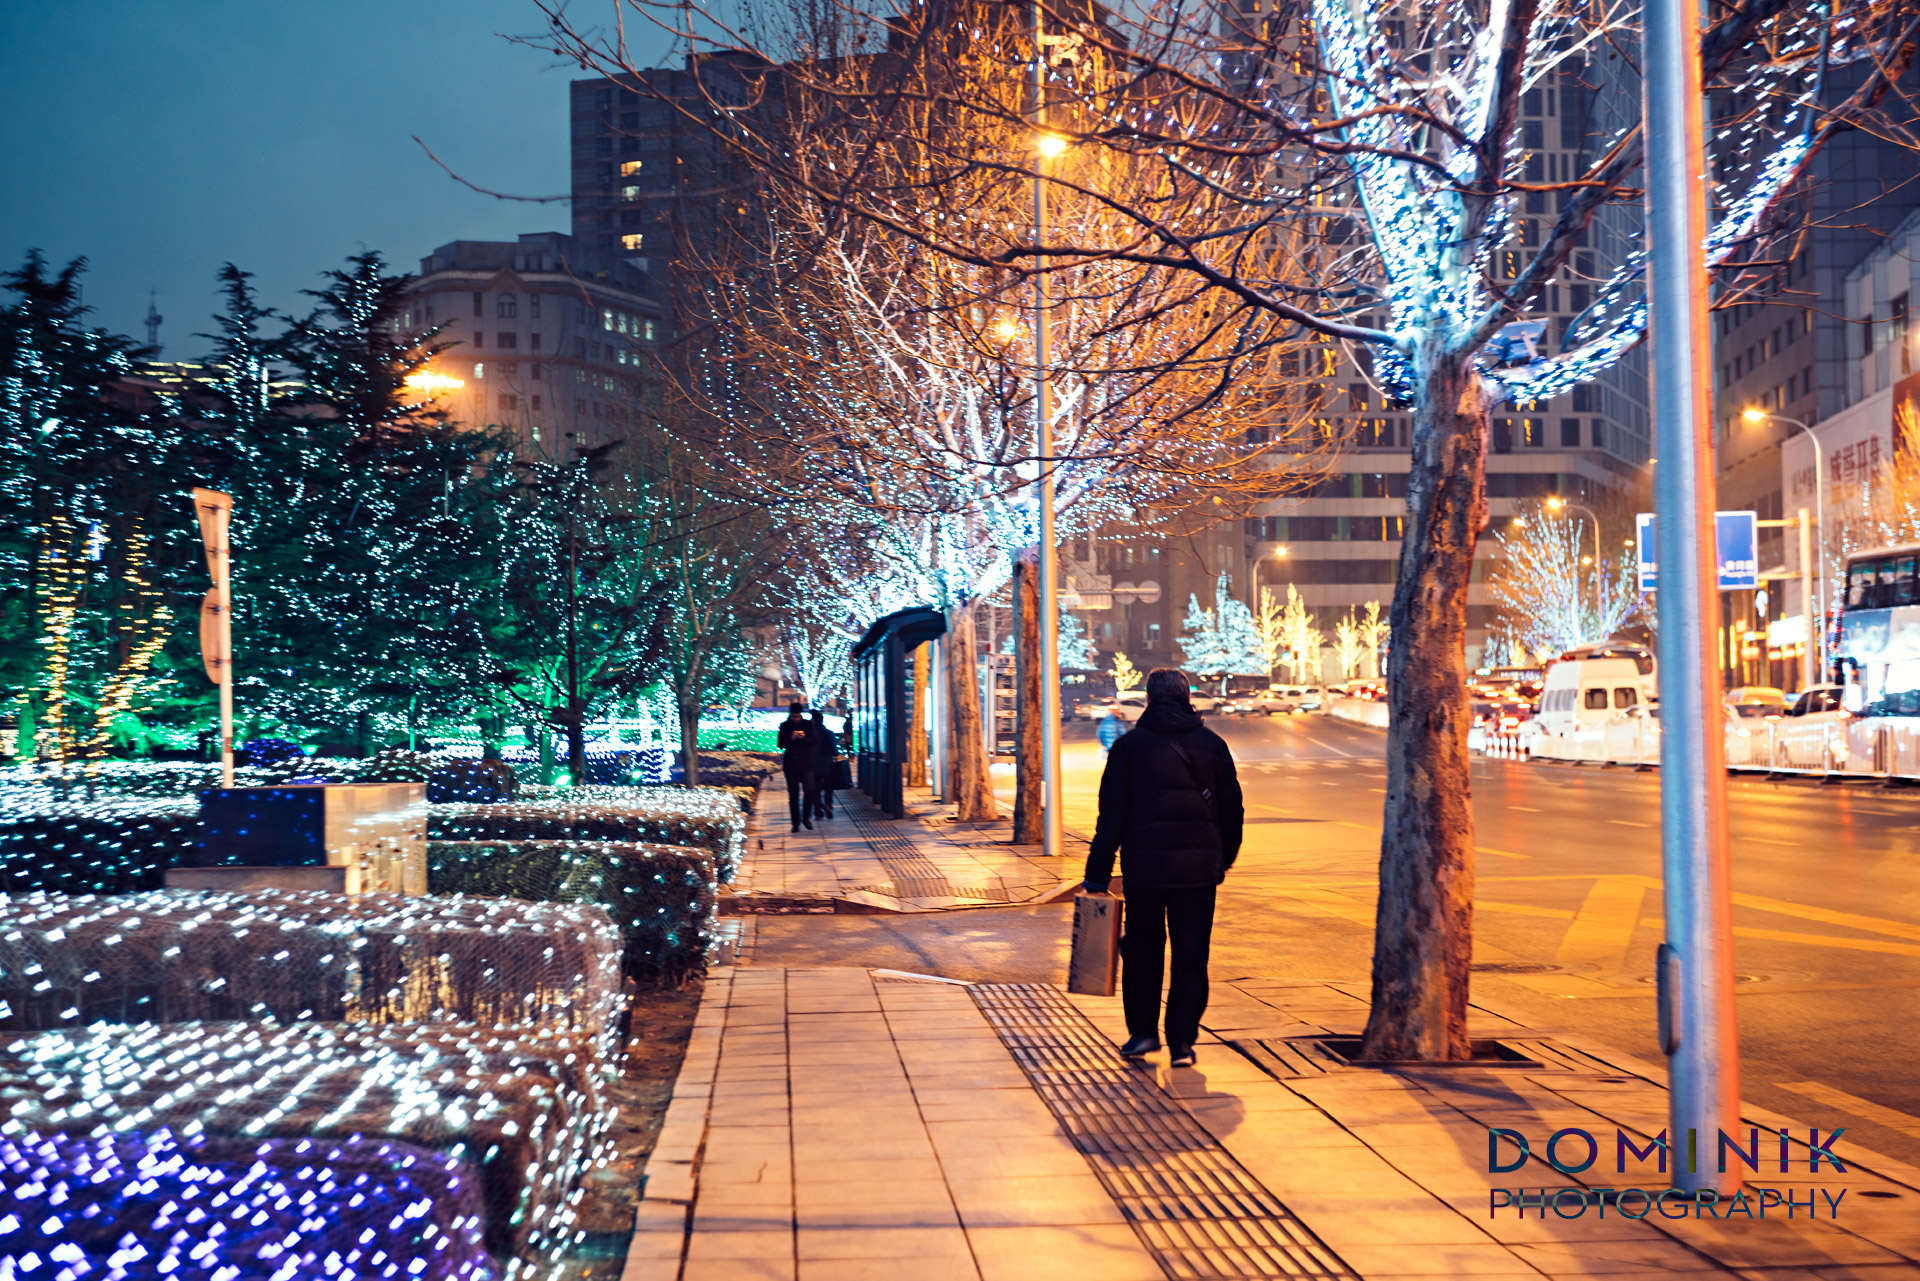 Dalian North East China Photographs by DOMINIK VANYI